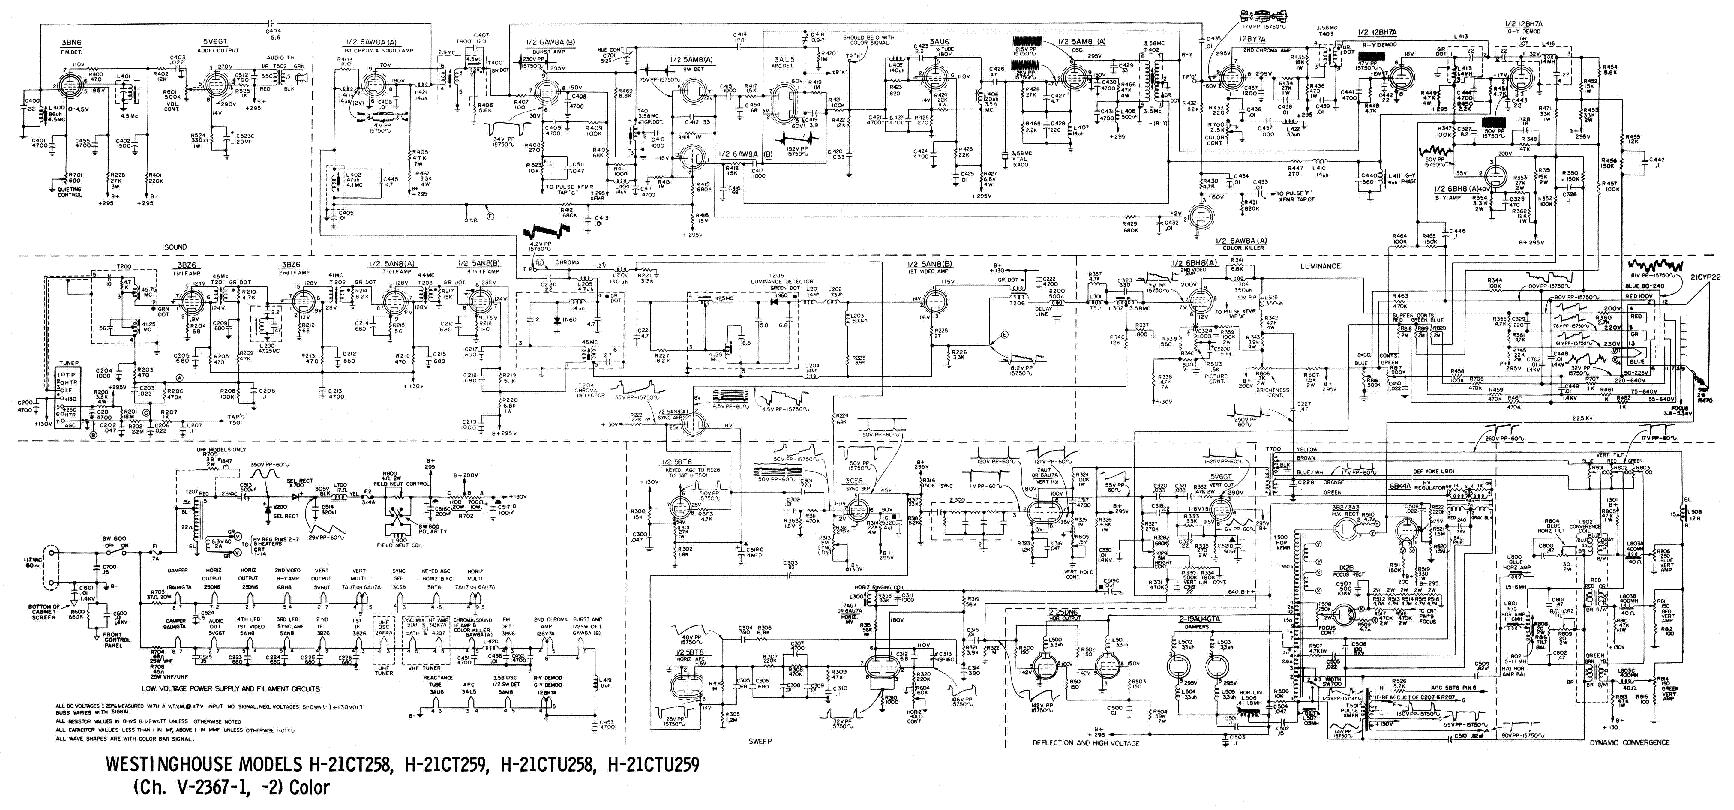 Fine Westinghouse W33001 Service Manual Download Schematics Eeprom Wiring Cloud Ittabpendurdonanfuldomelitekicepsianuembamohammedshrineorg